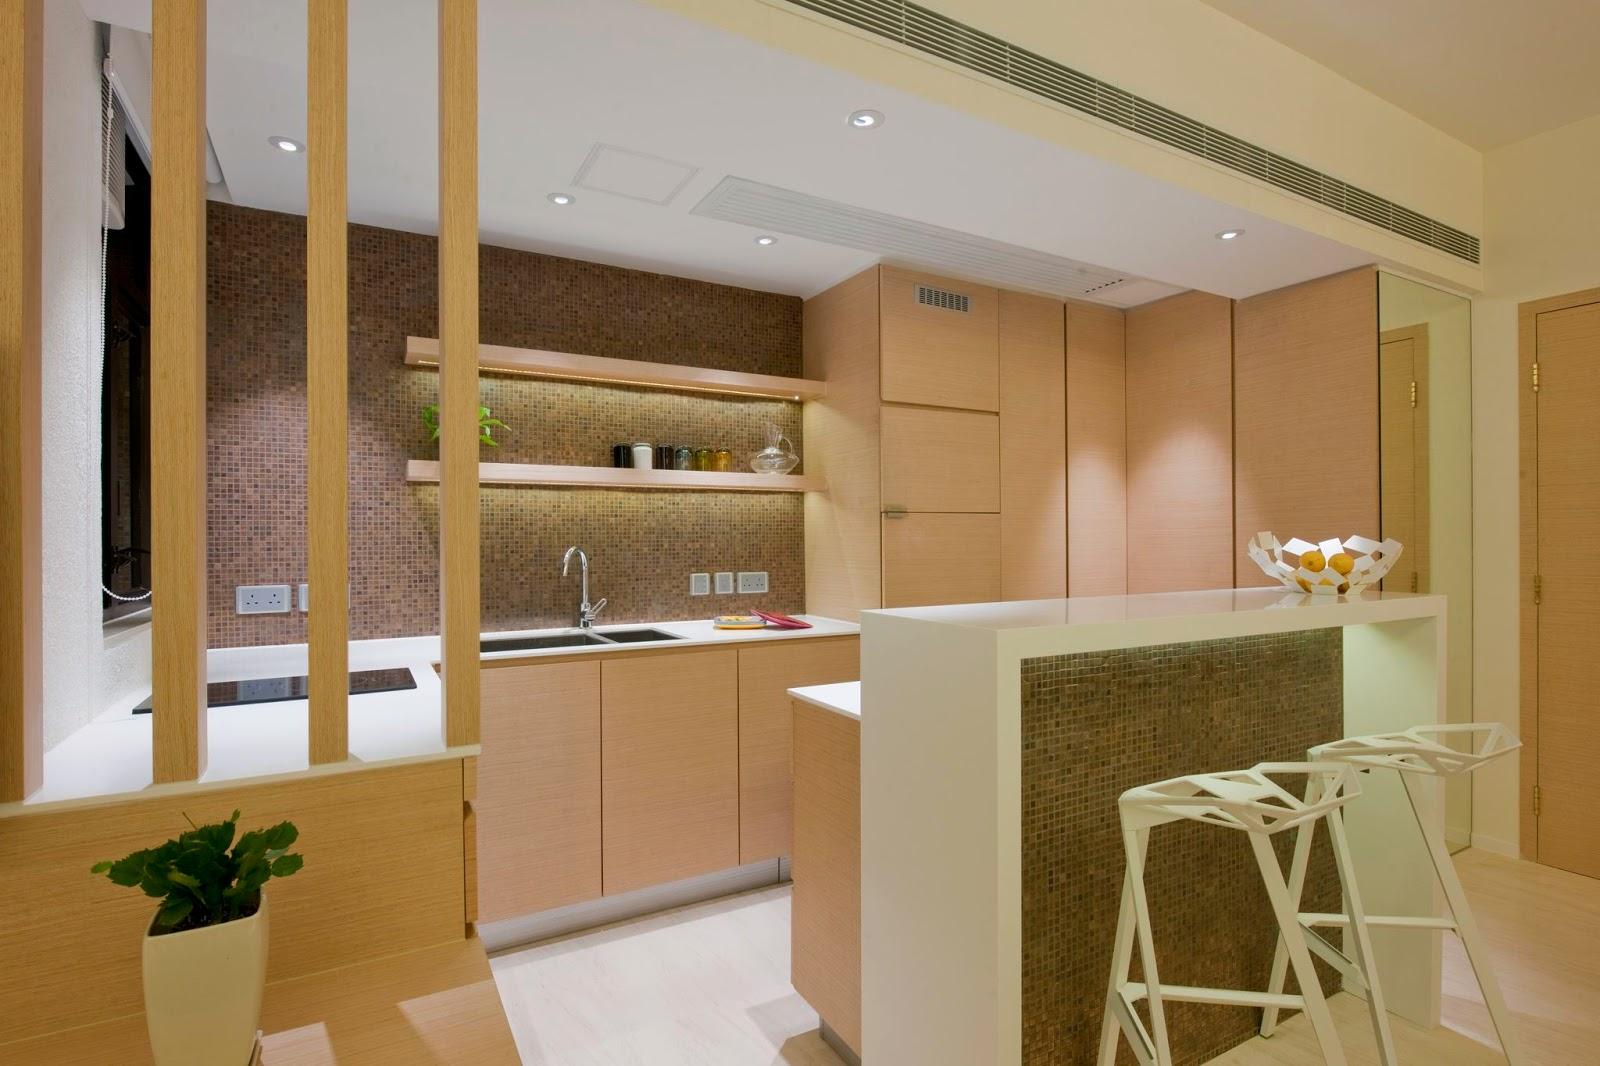 hong kong interior design tips & ideas | clifton leung: hotel-like